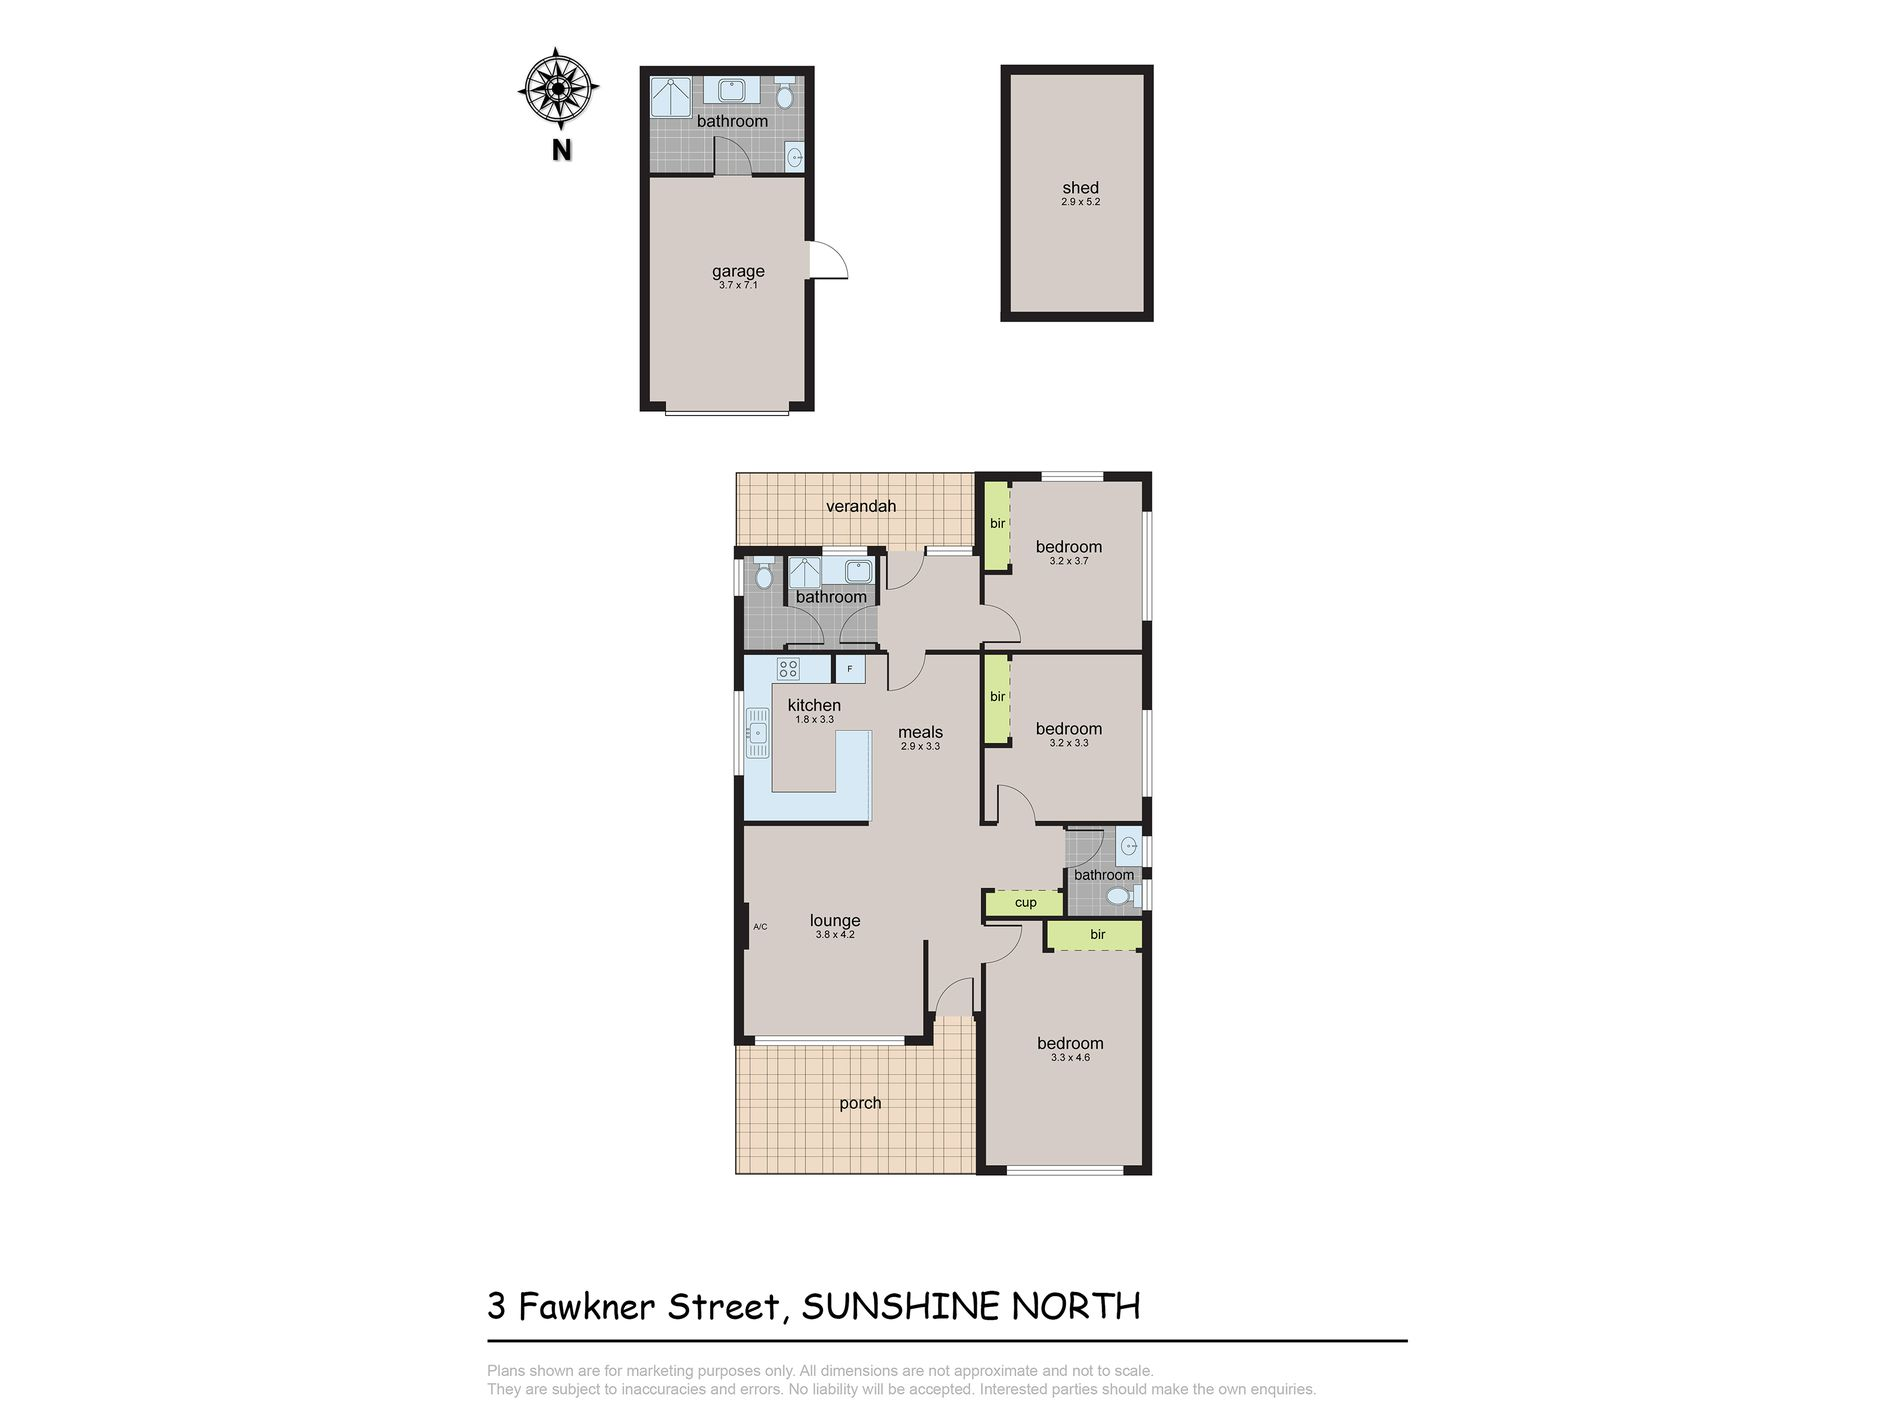 3 Fawkner Street, Sunshine North